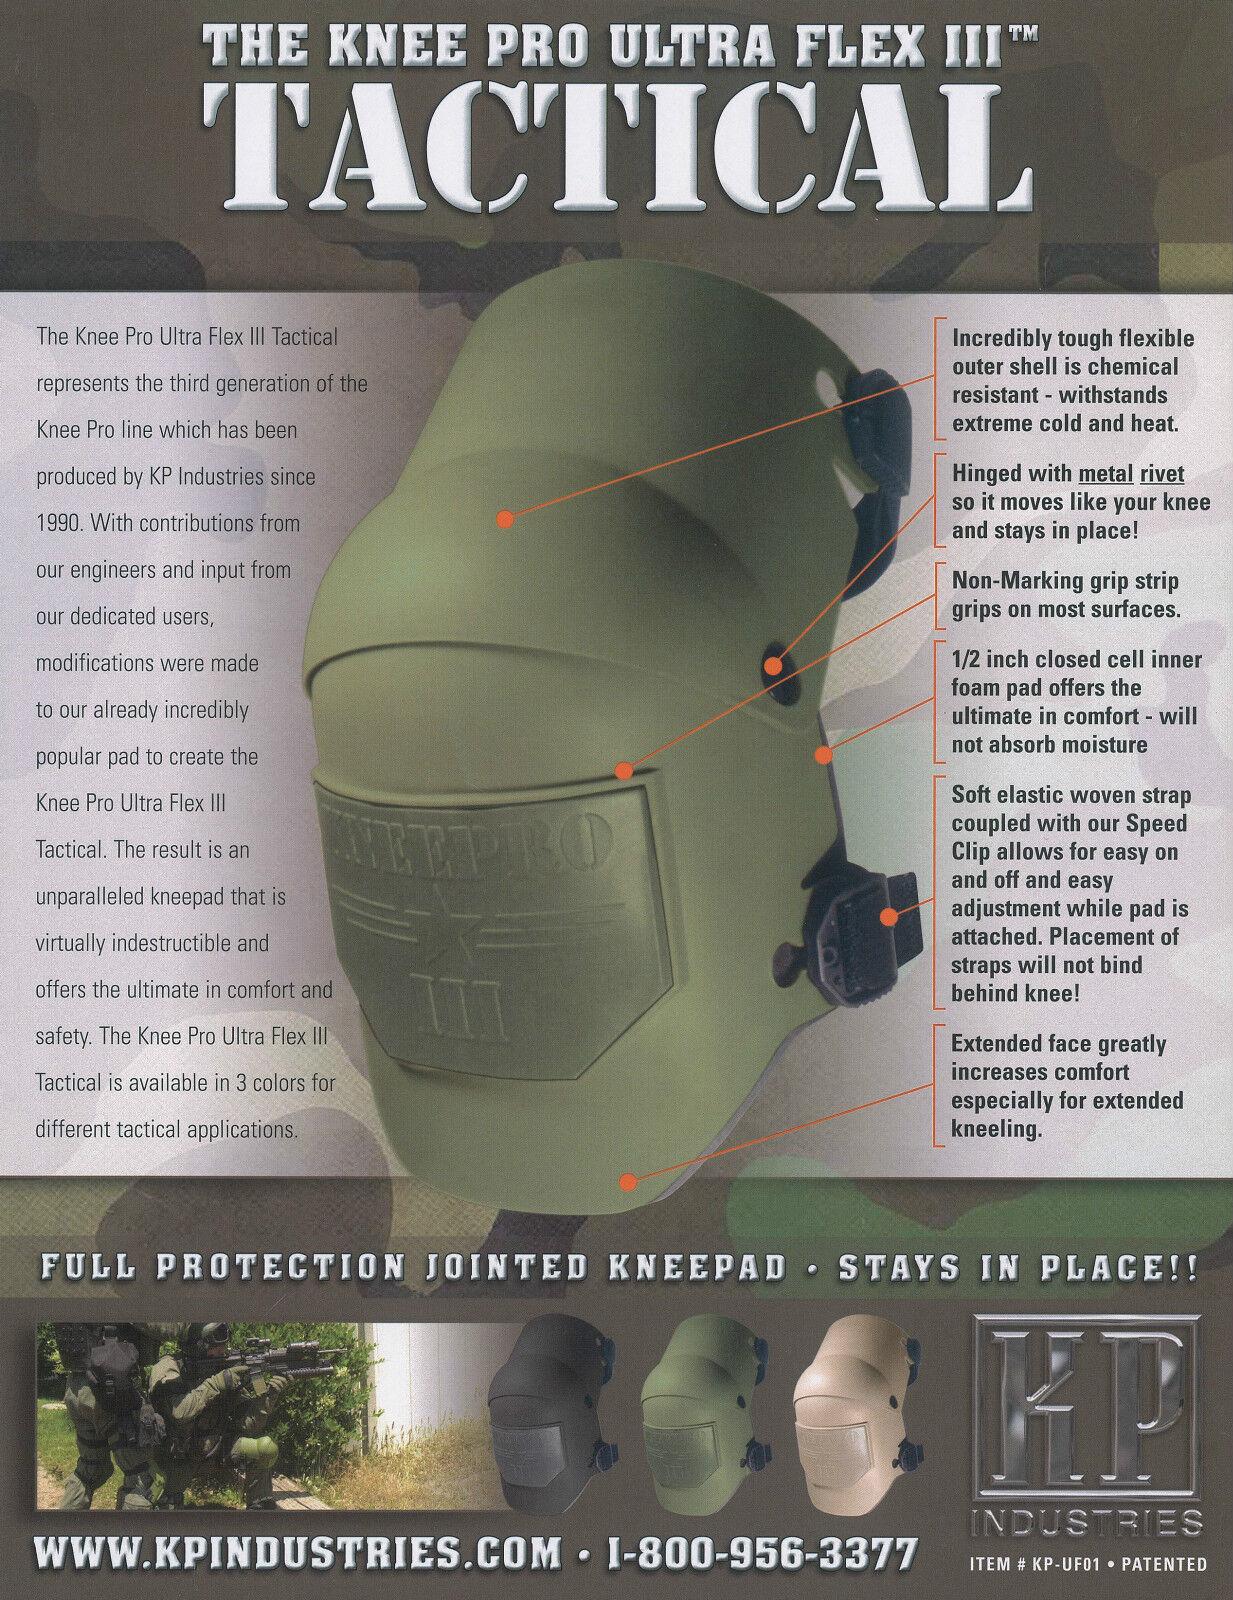 KP Industries Tactical Knee Pro Ultra Flex III Knee Pads in Black